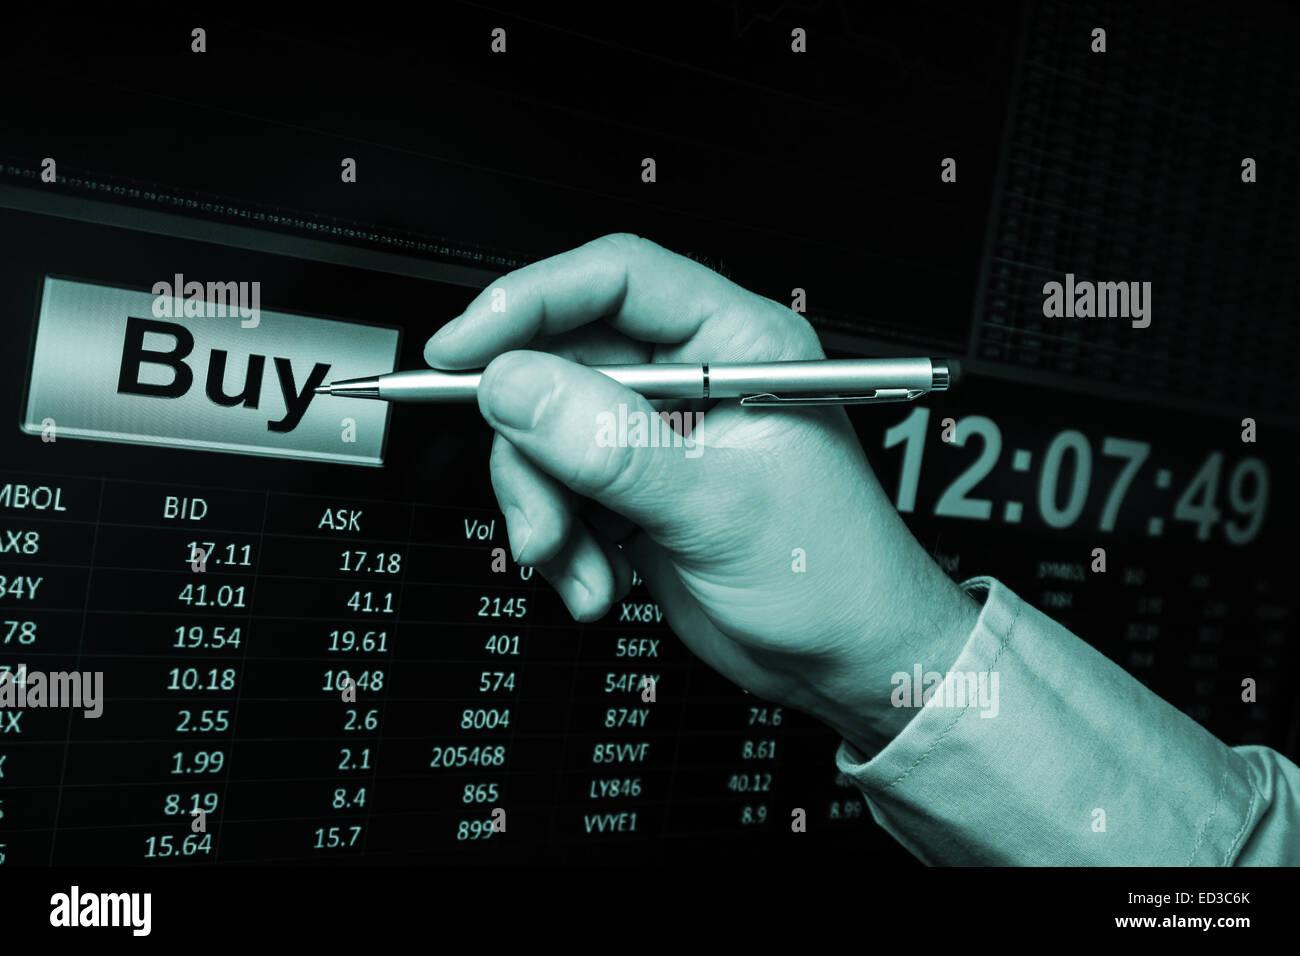 Stock Price Quote Trade Stock Photos Stock Price Quote Trade Stock